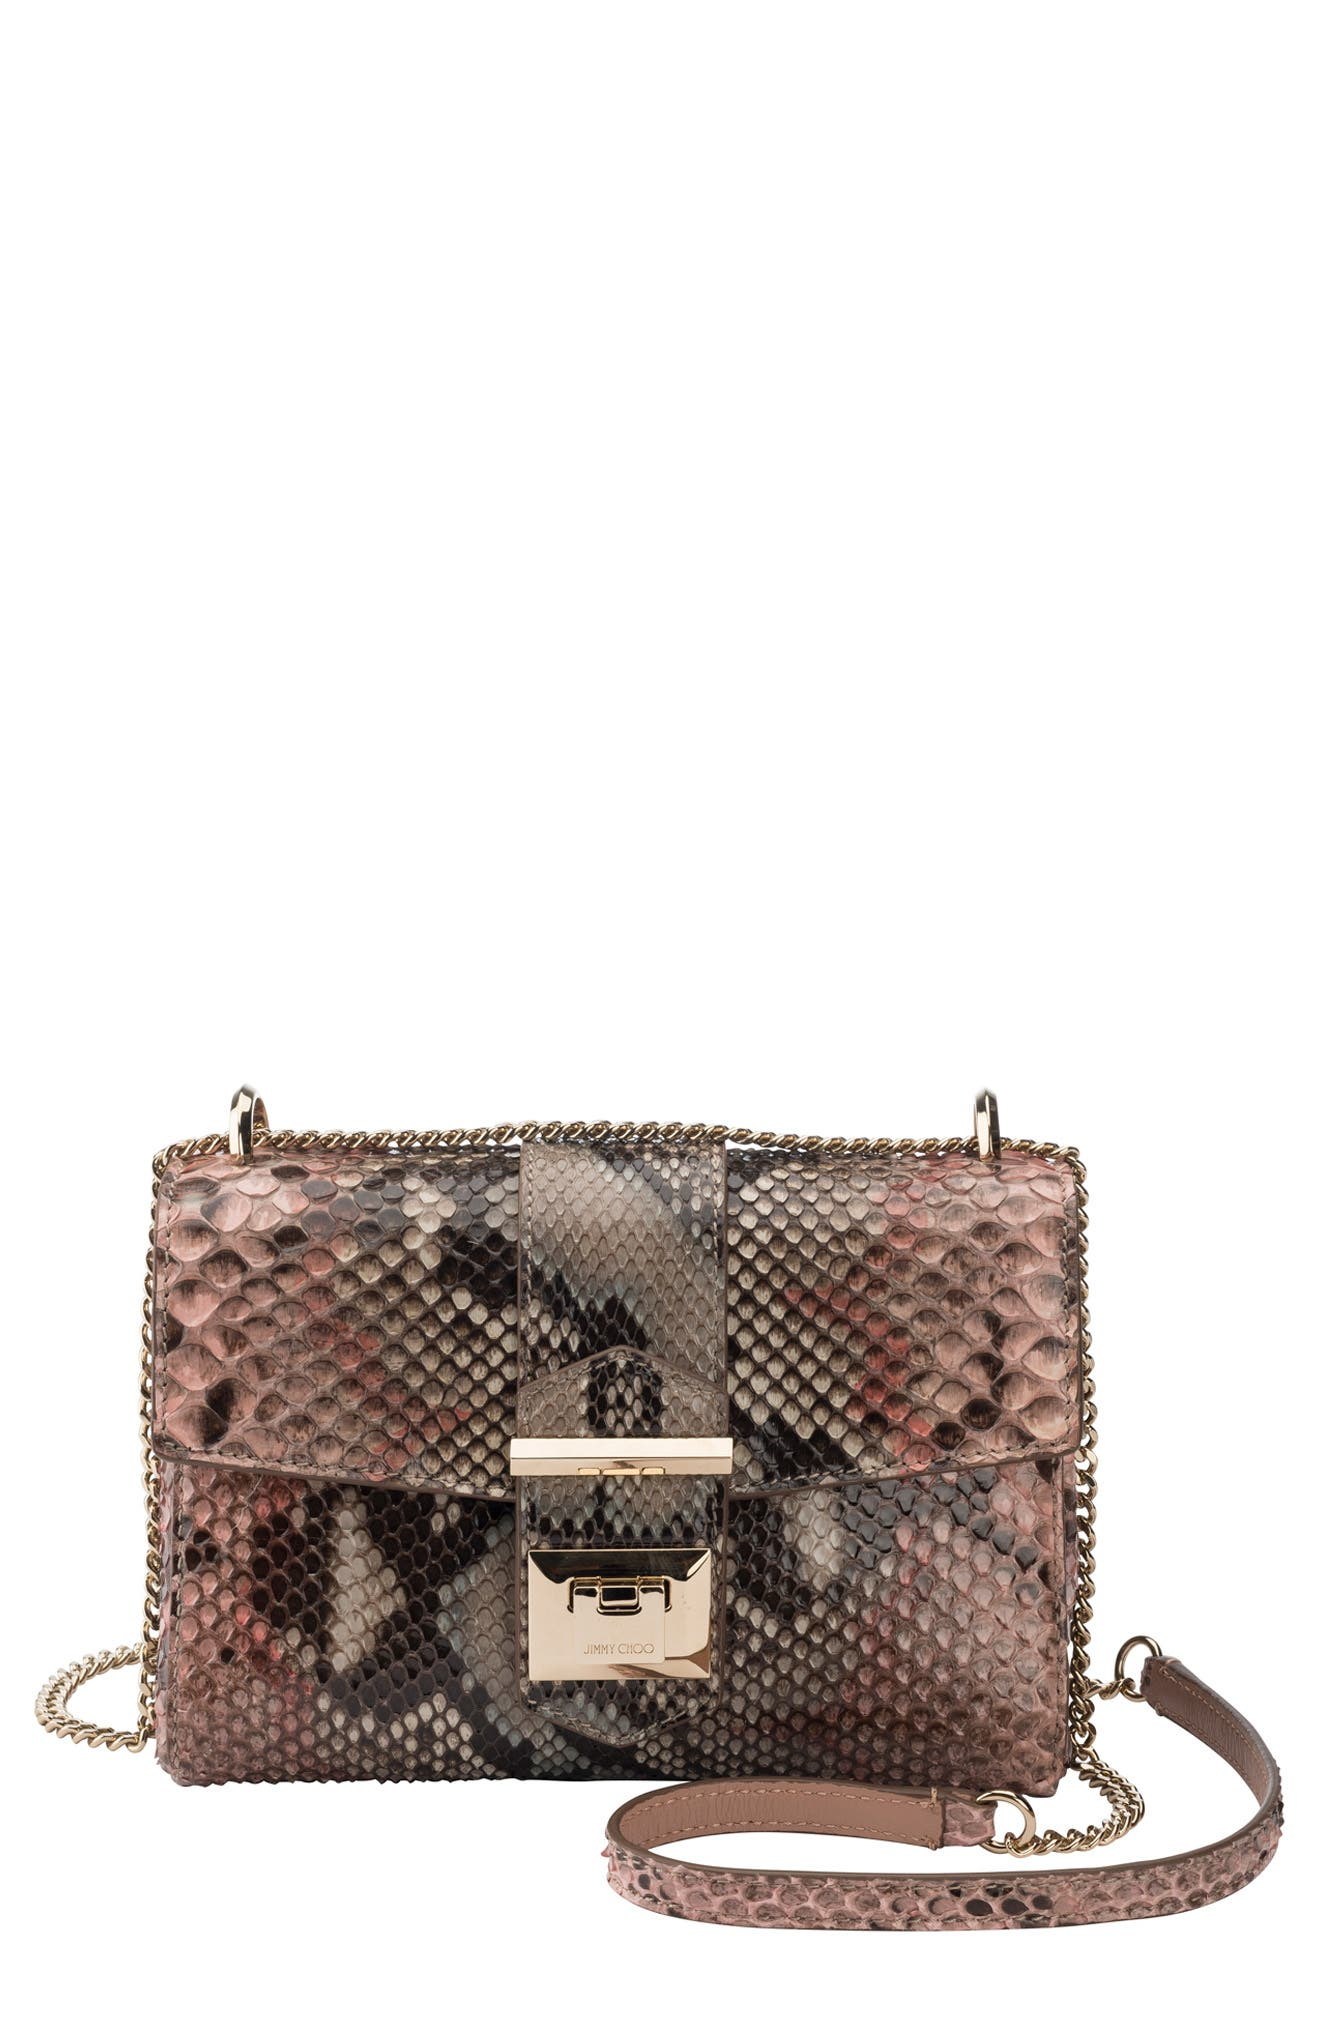 JIMMY CHOO Marianne Genuine Python Crossbody Bag, Main, color, ROSEWOOD MIX